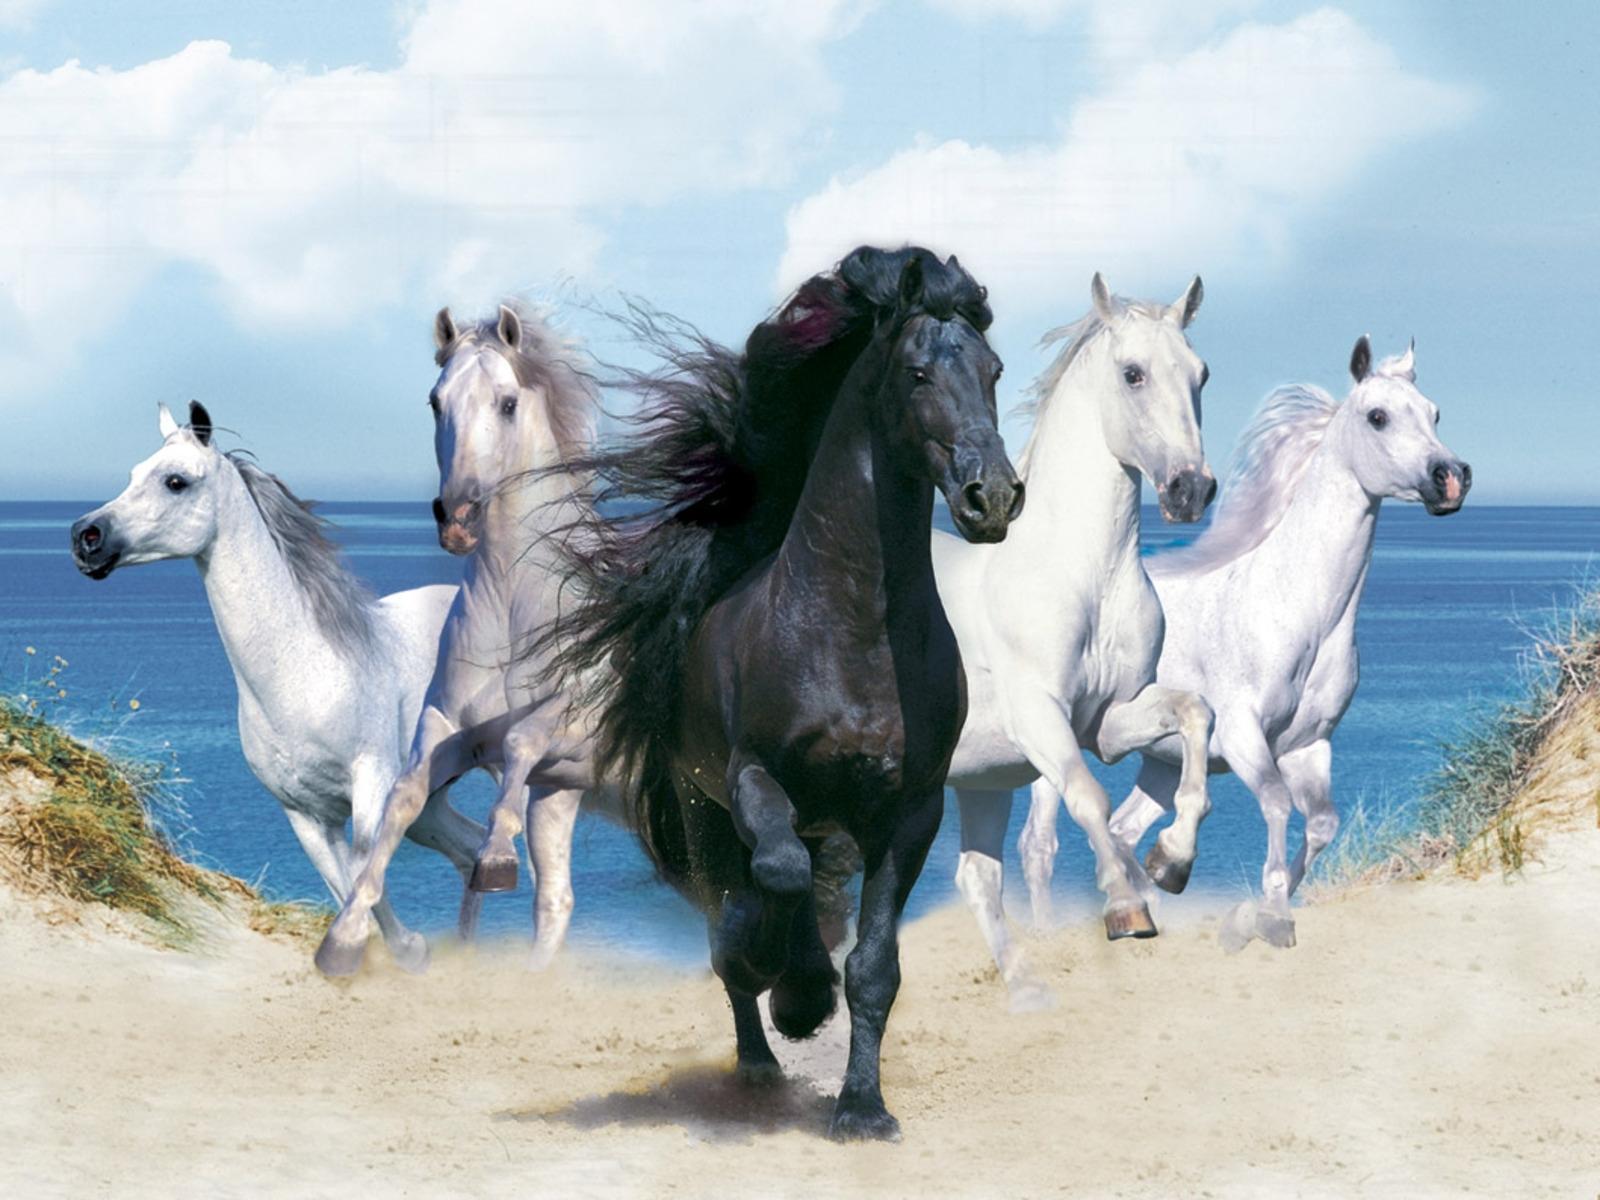 animals wallpapers fantasy beautiful horses   horse, horse wallpaper